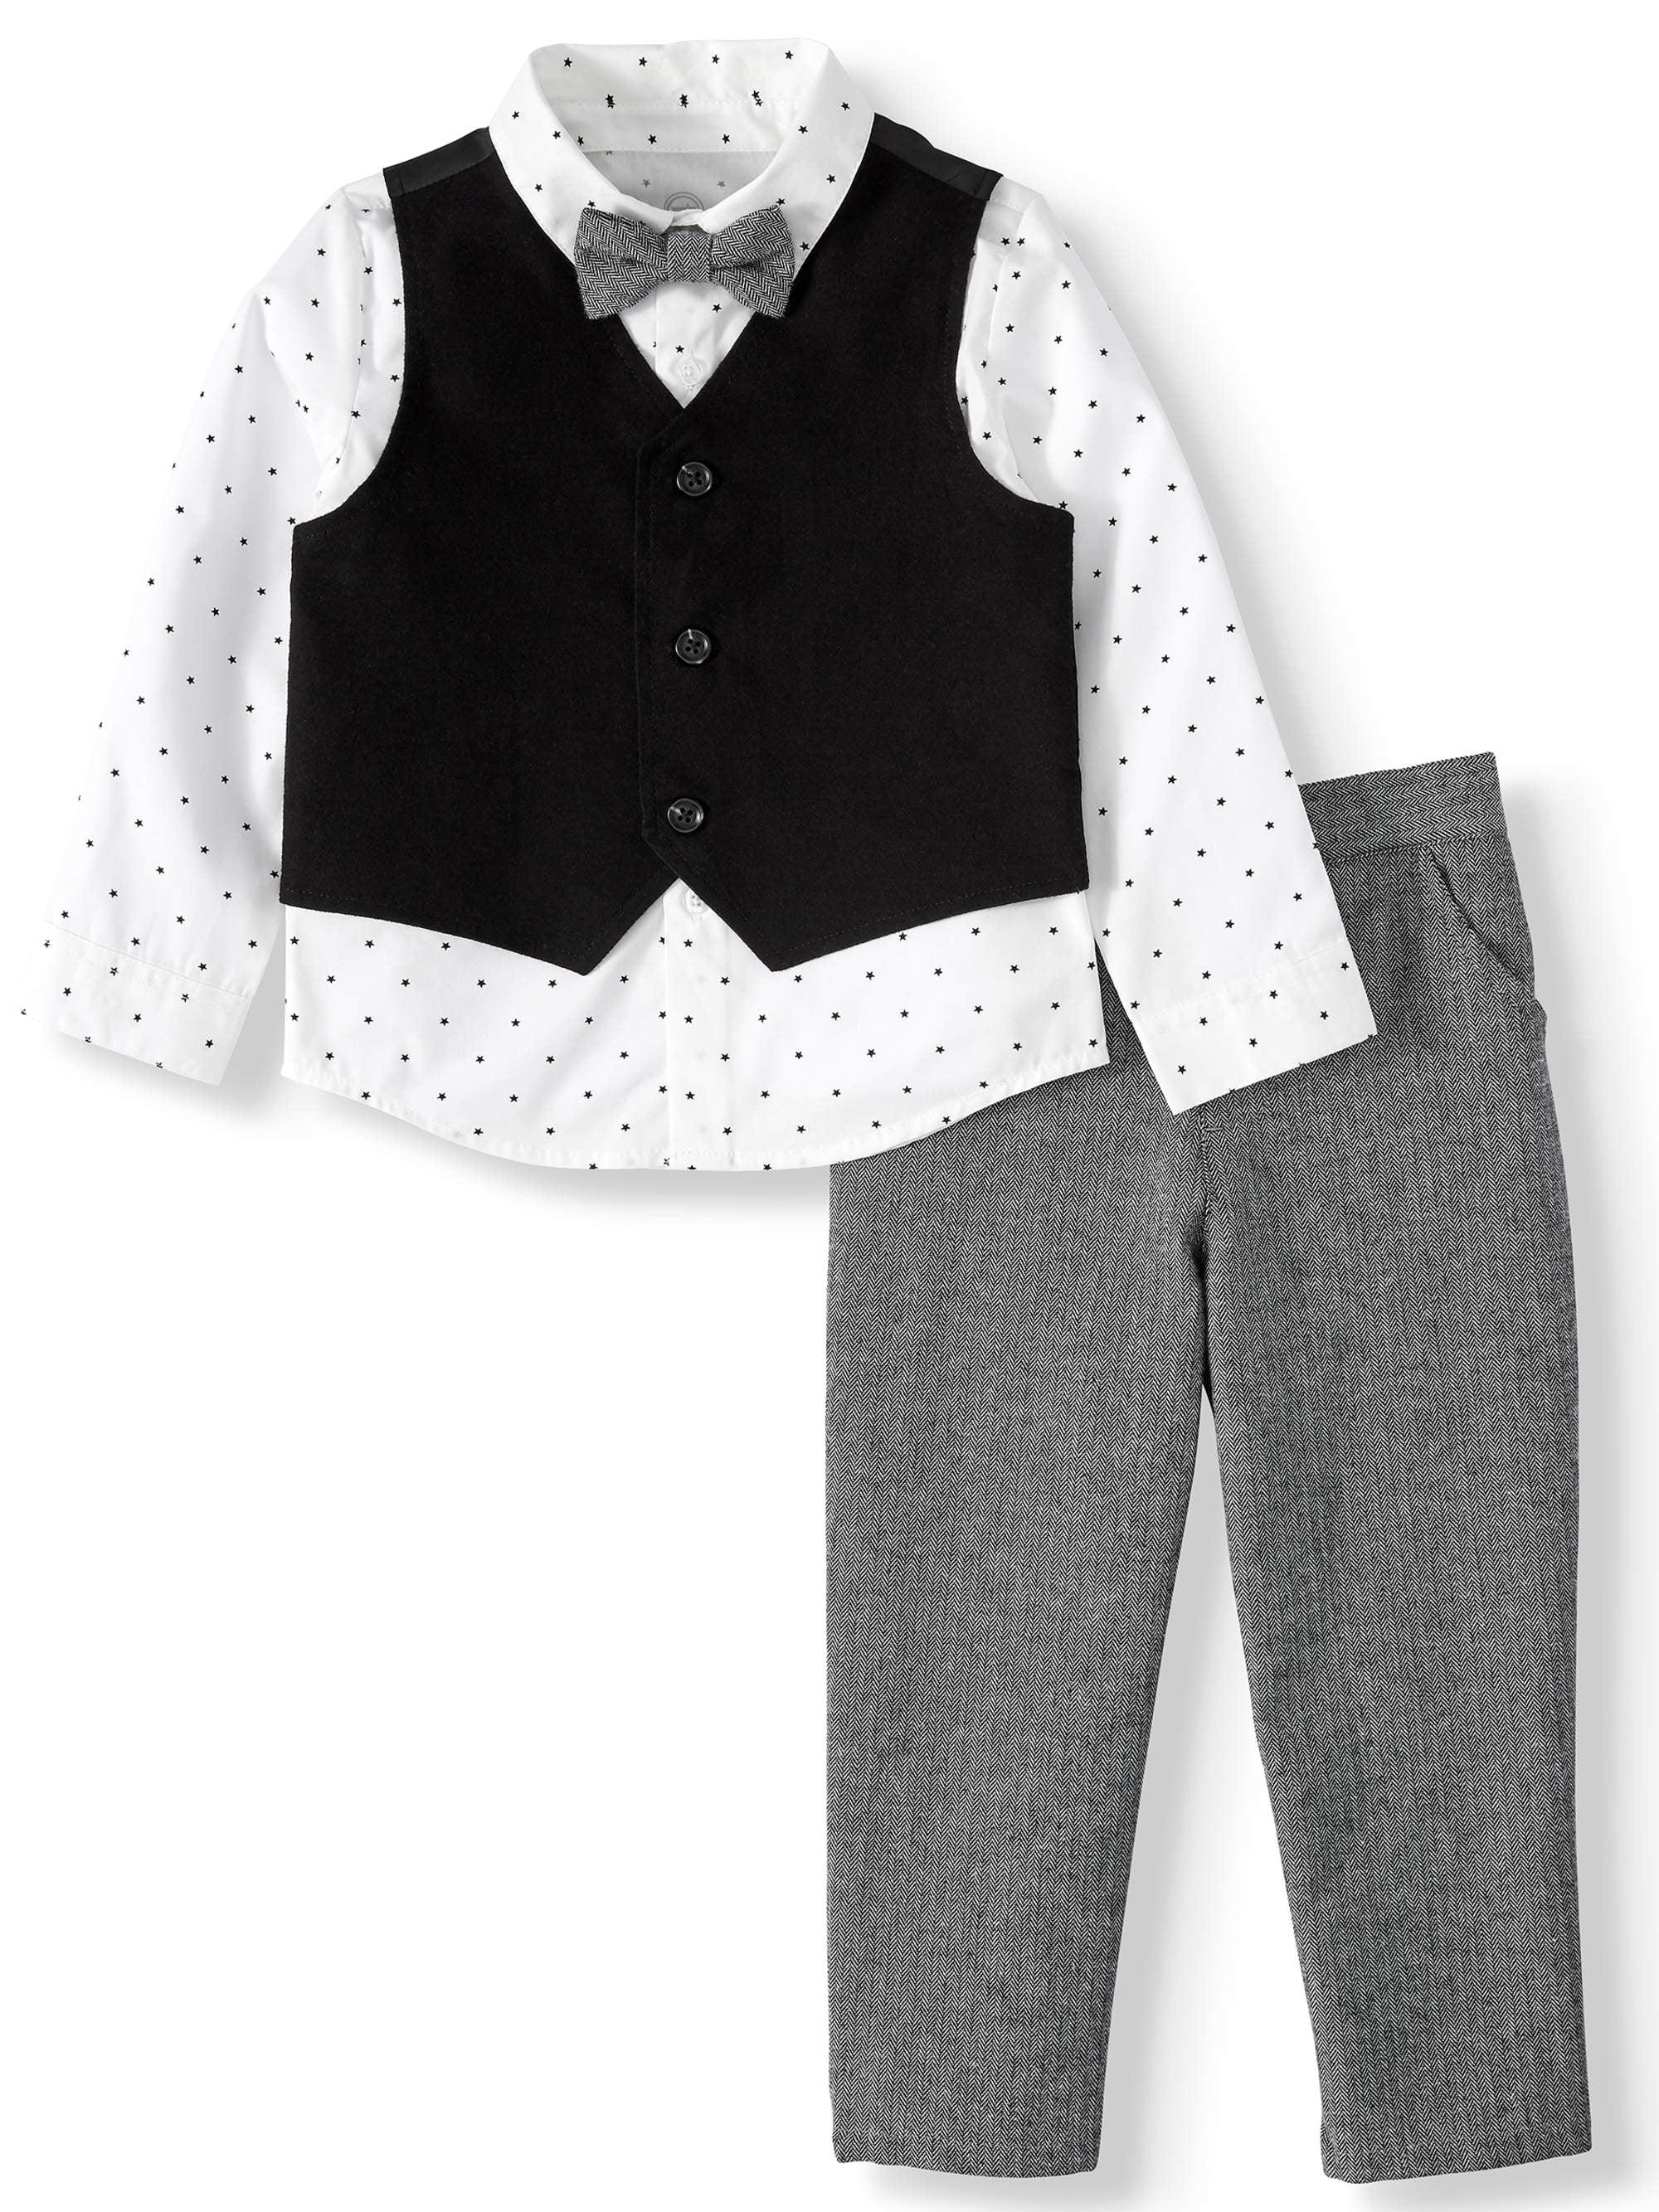 Wonder Nation Baby Boy Long Sleeve Button Up, Vest, Bowtie & Pants 4pc Outfit Set